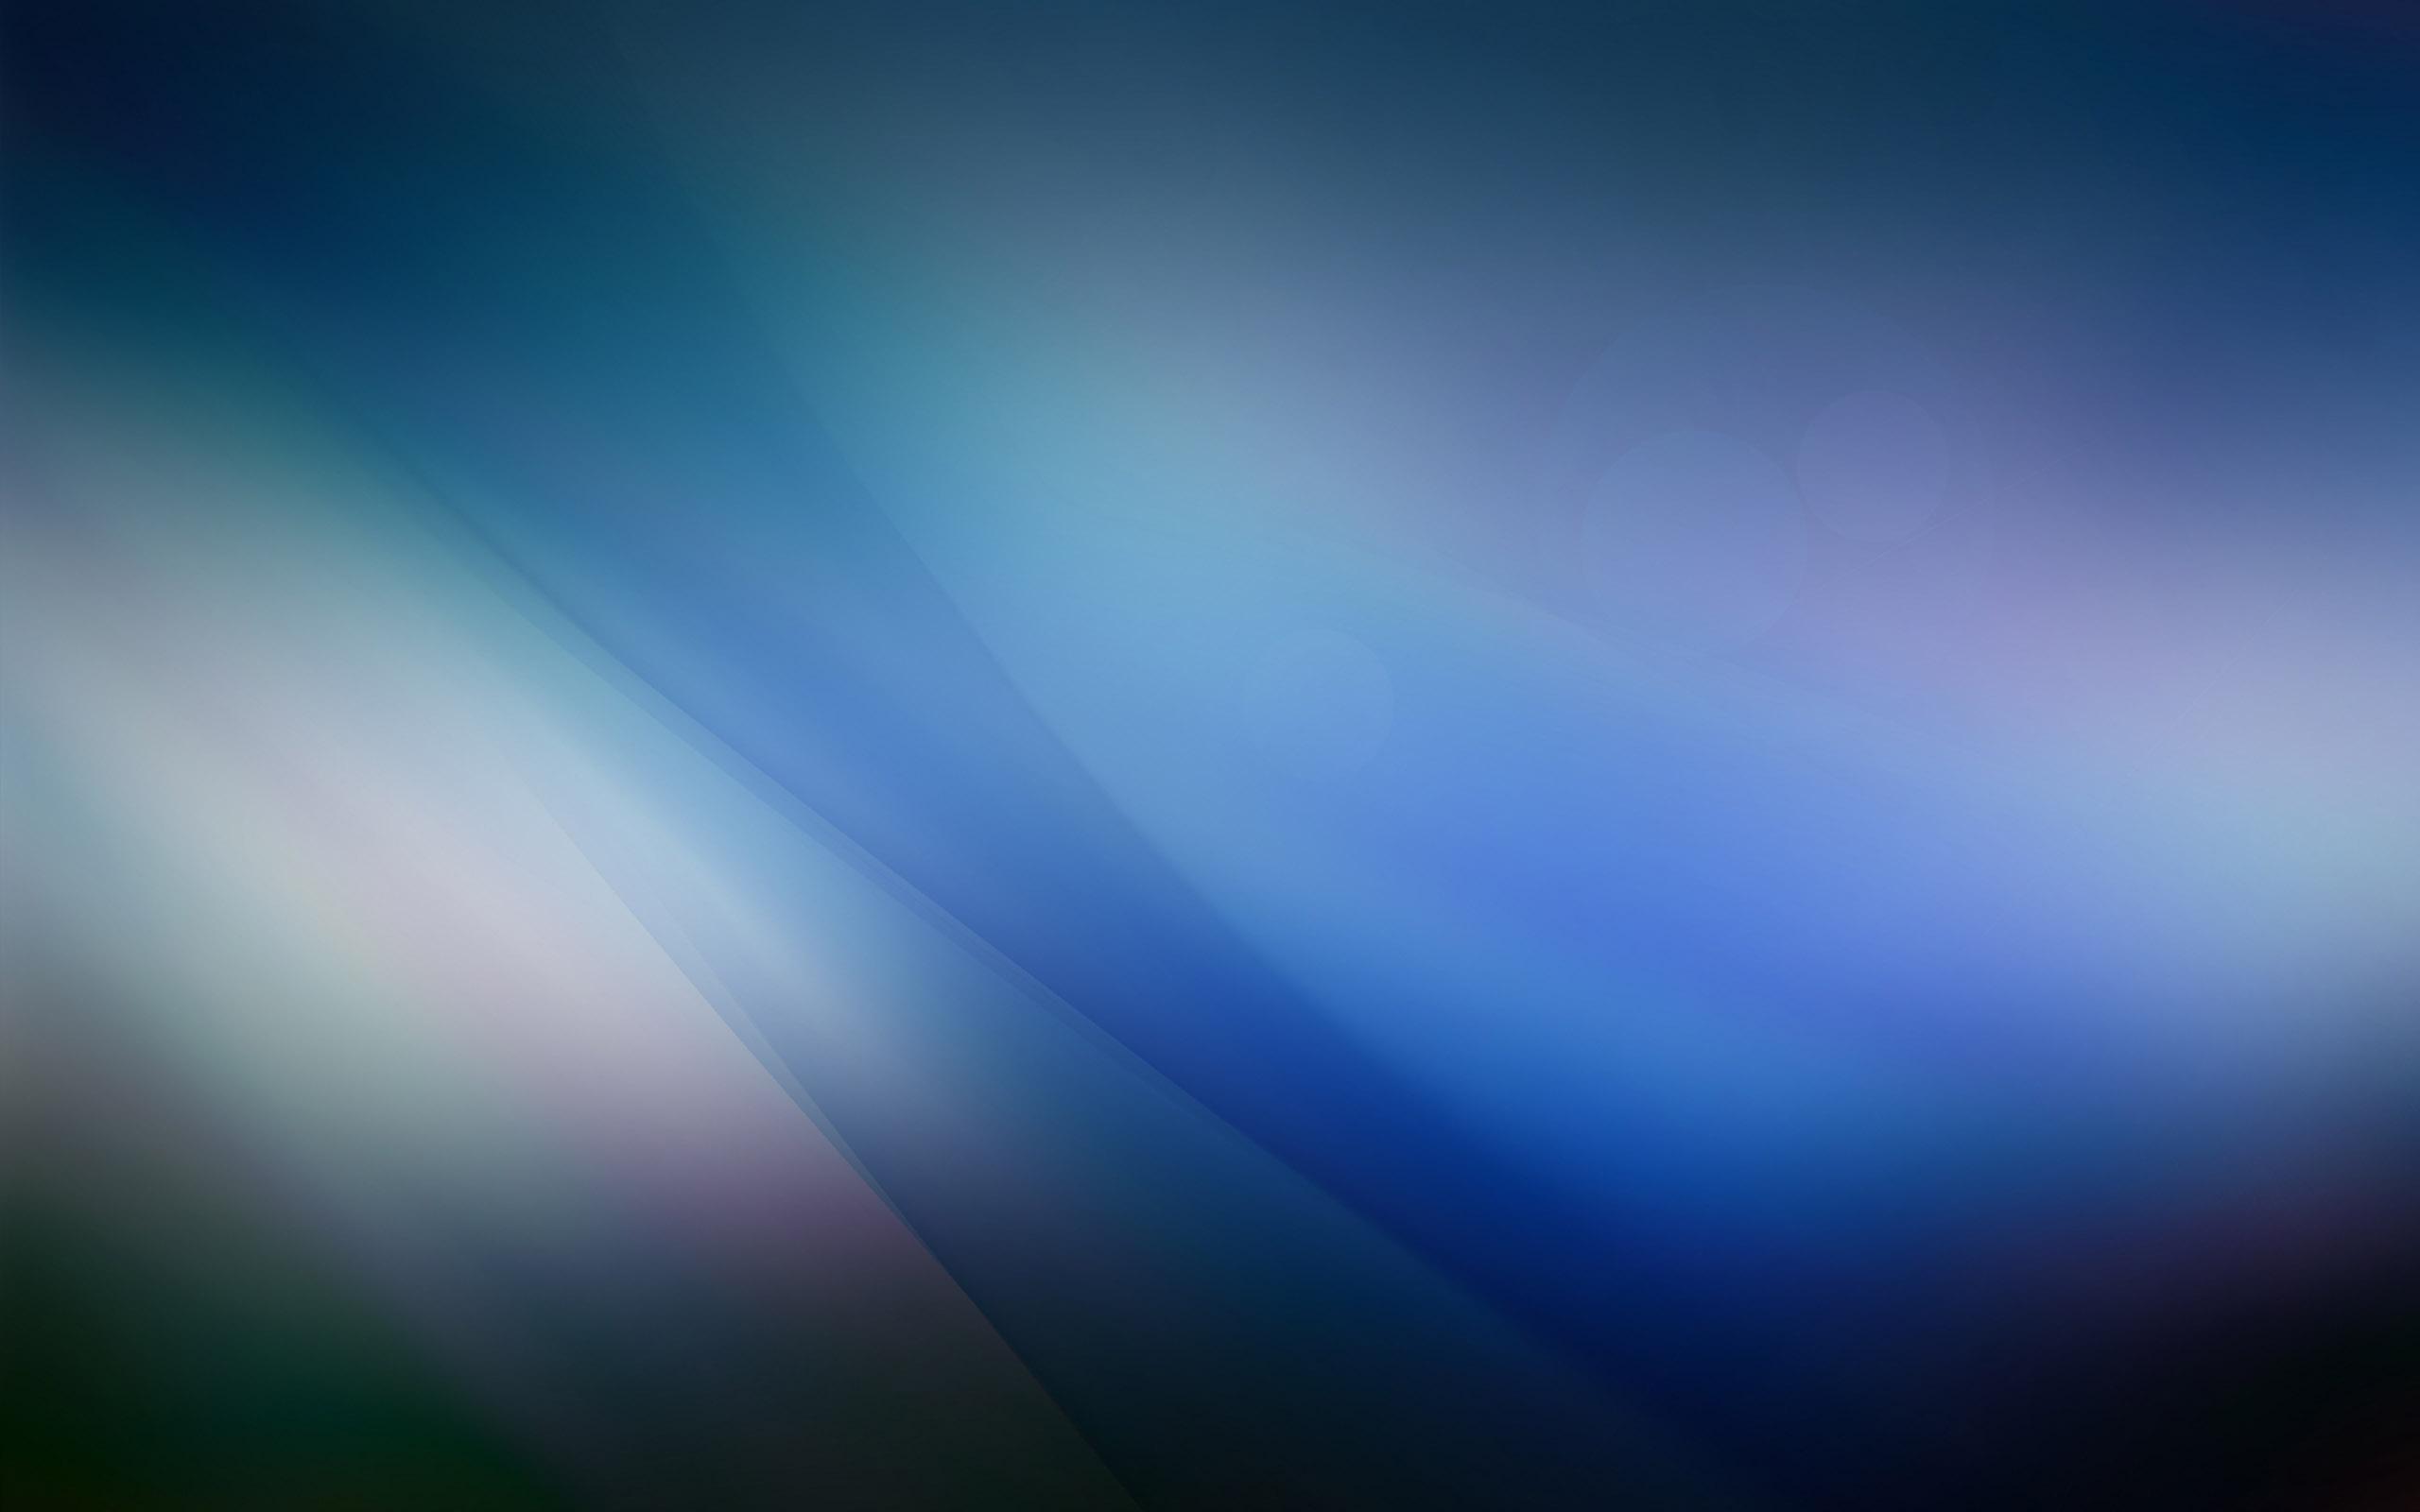 Gradient Desktop Wallpapers - WallpaperSafari Light Blue Gradient Tumblr